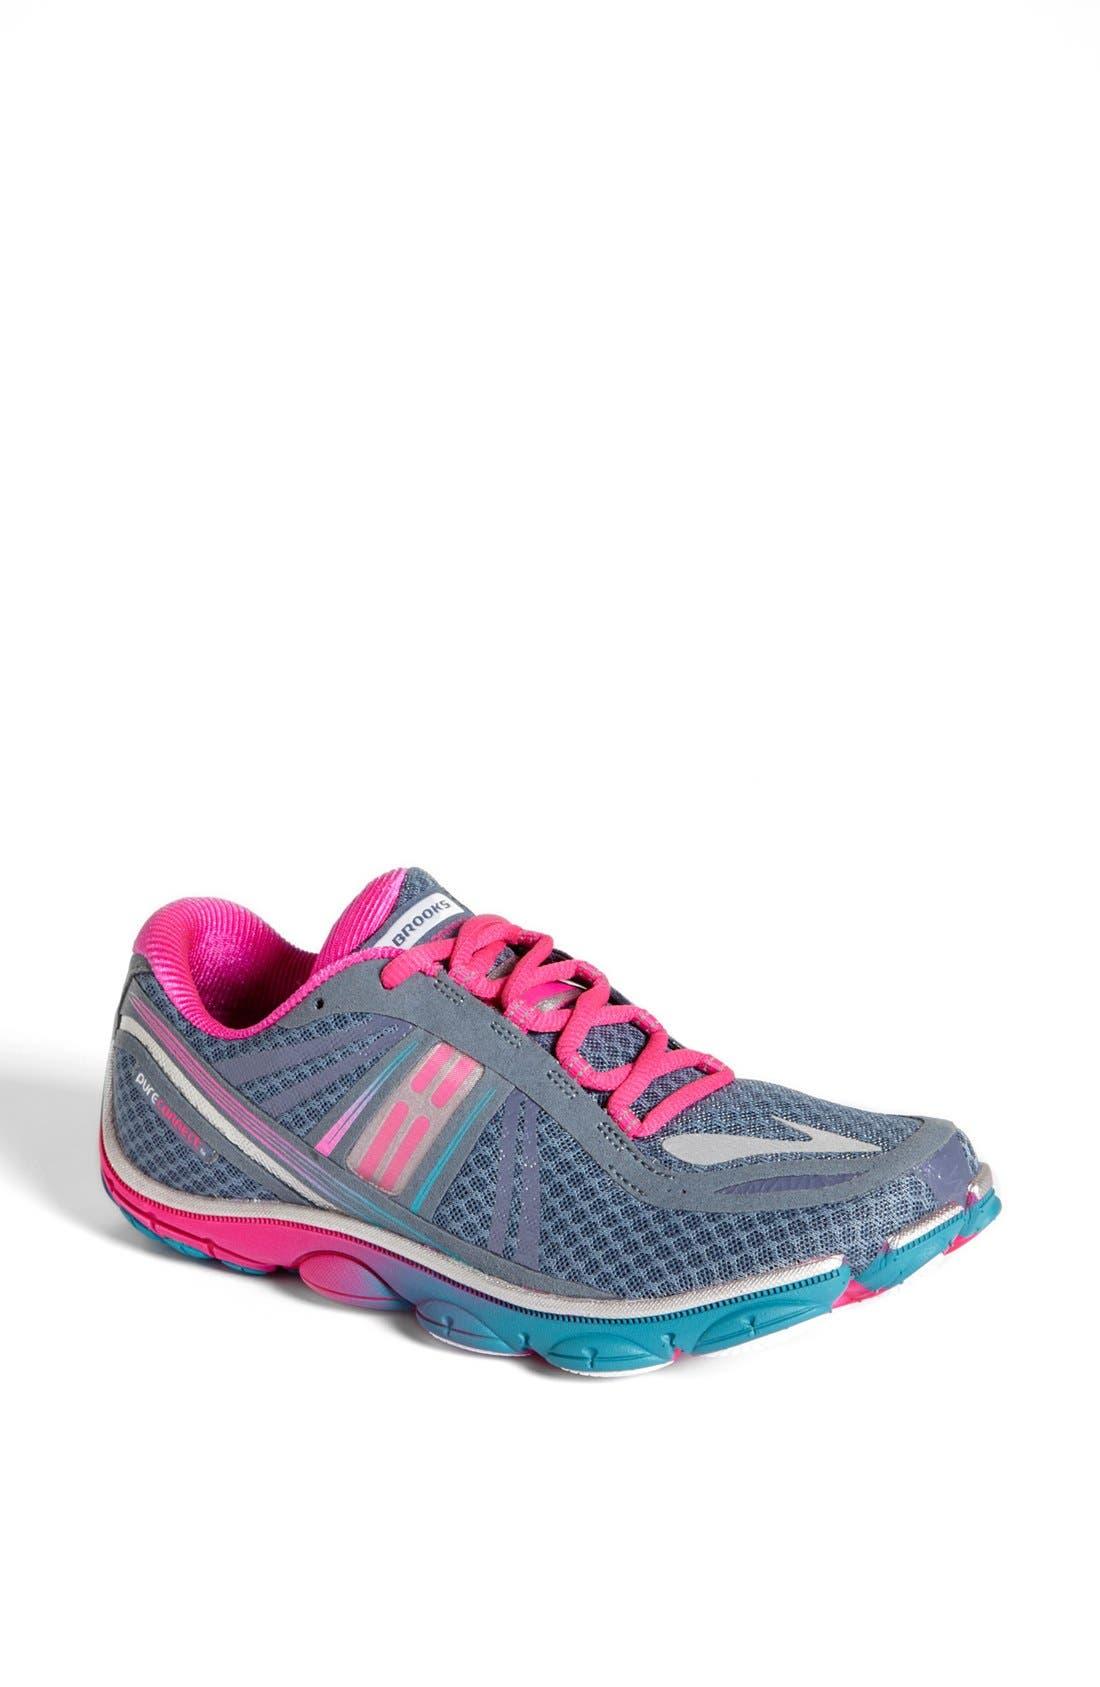 Main Image - Brooks 'PureConnect 3' Running Shoe (Women)